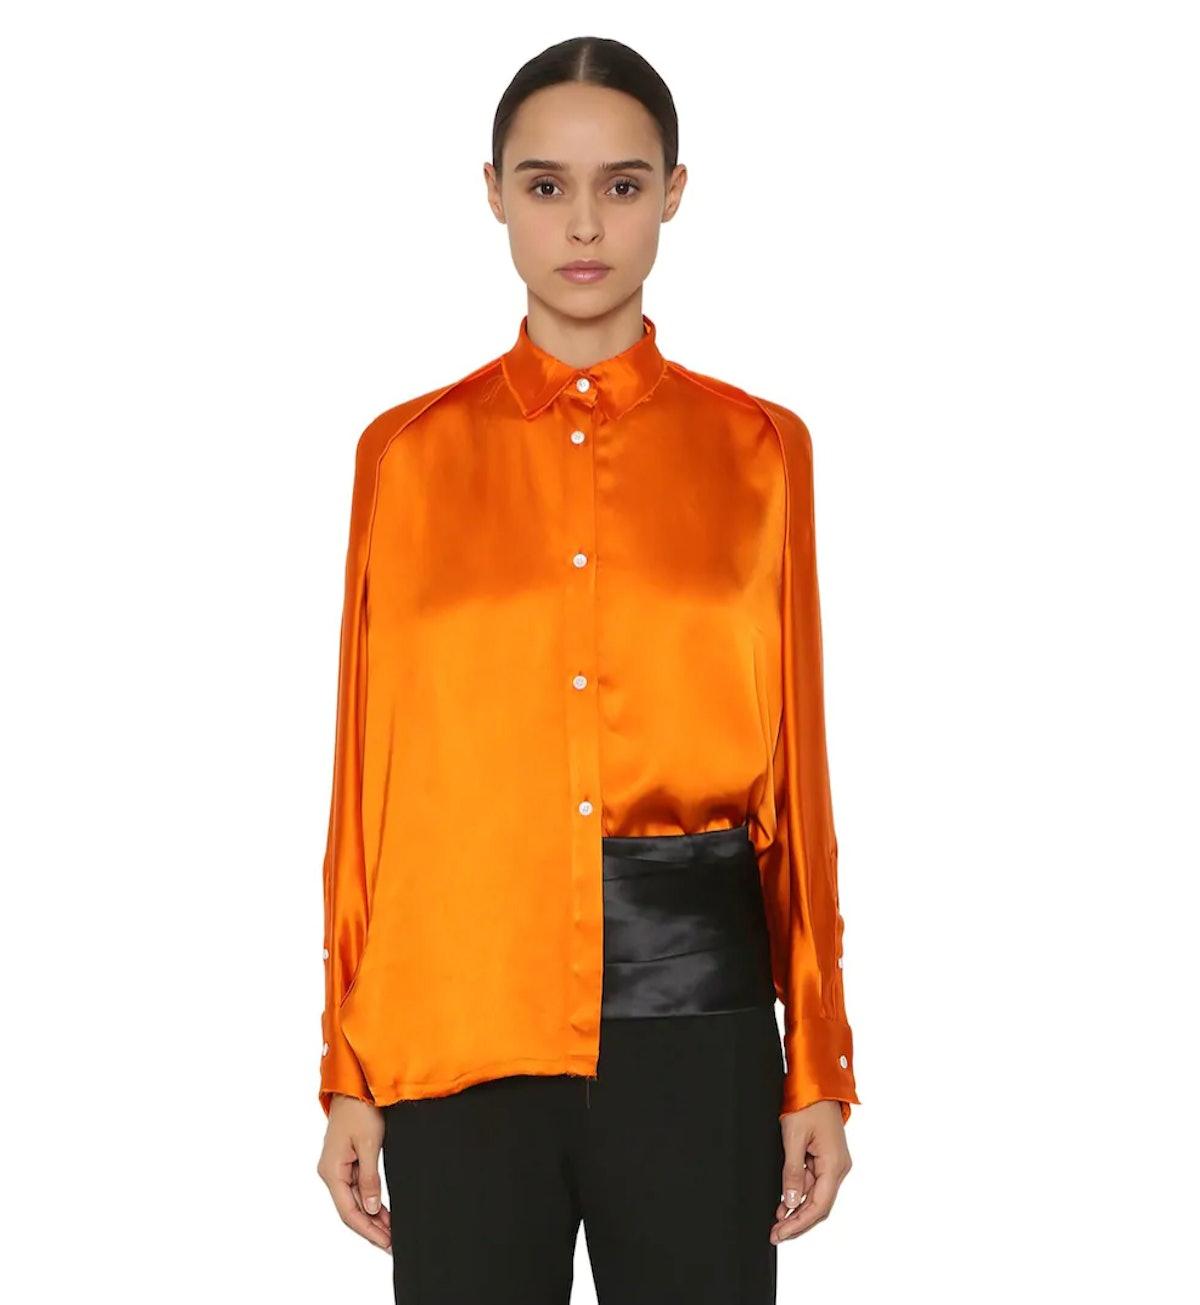 Oversize Satin Shirt in Orange